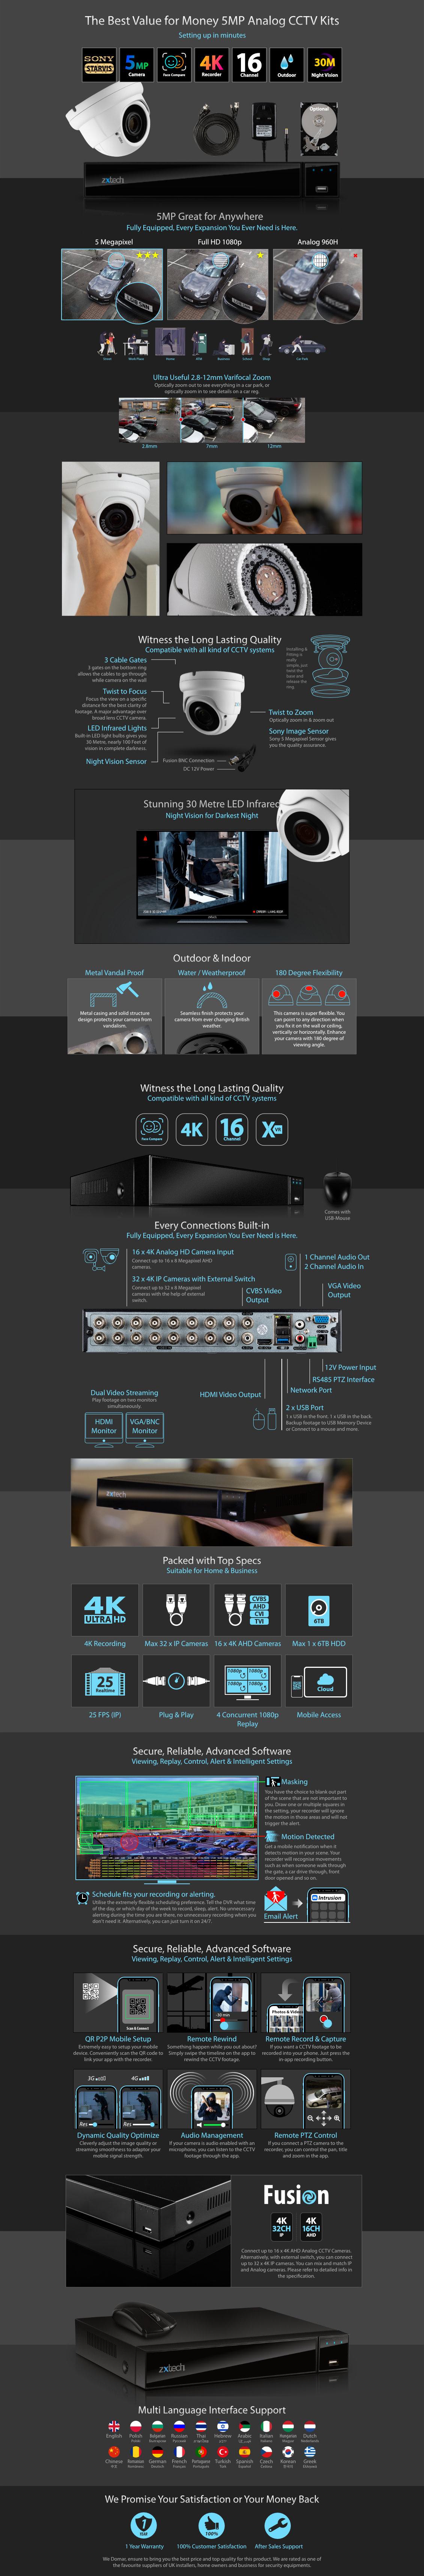 5MP AHD Camera System Home Digital Recorder HD Analog Camera Waterproof Varifocal | AF15D16X